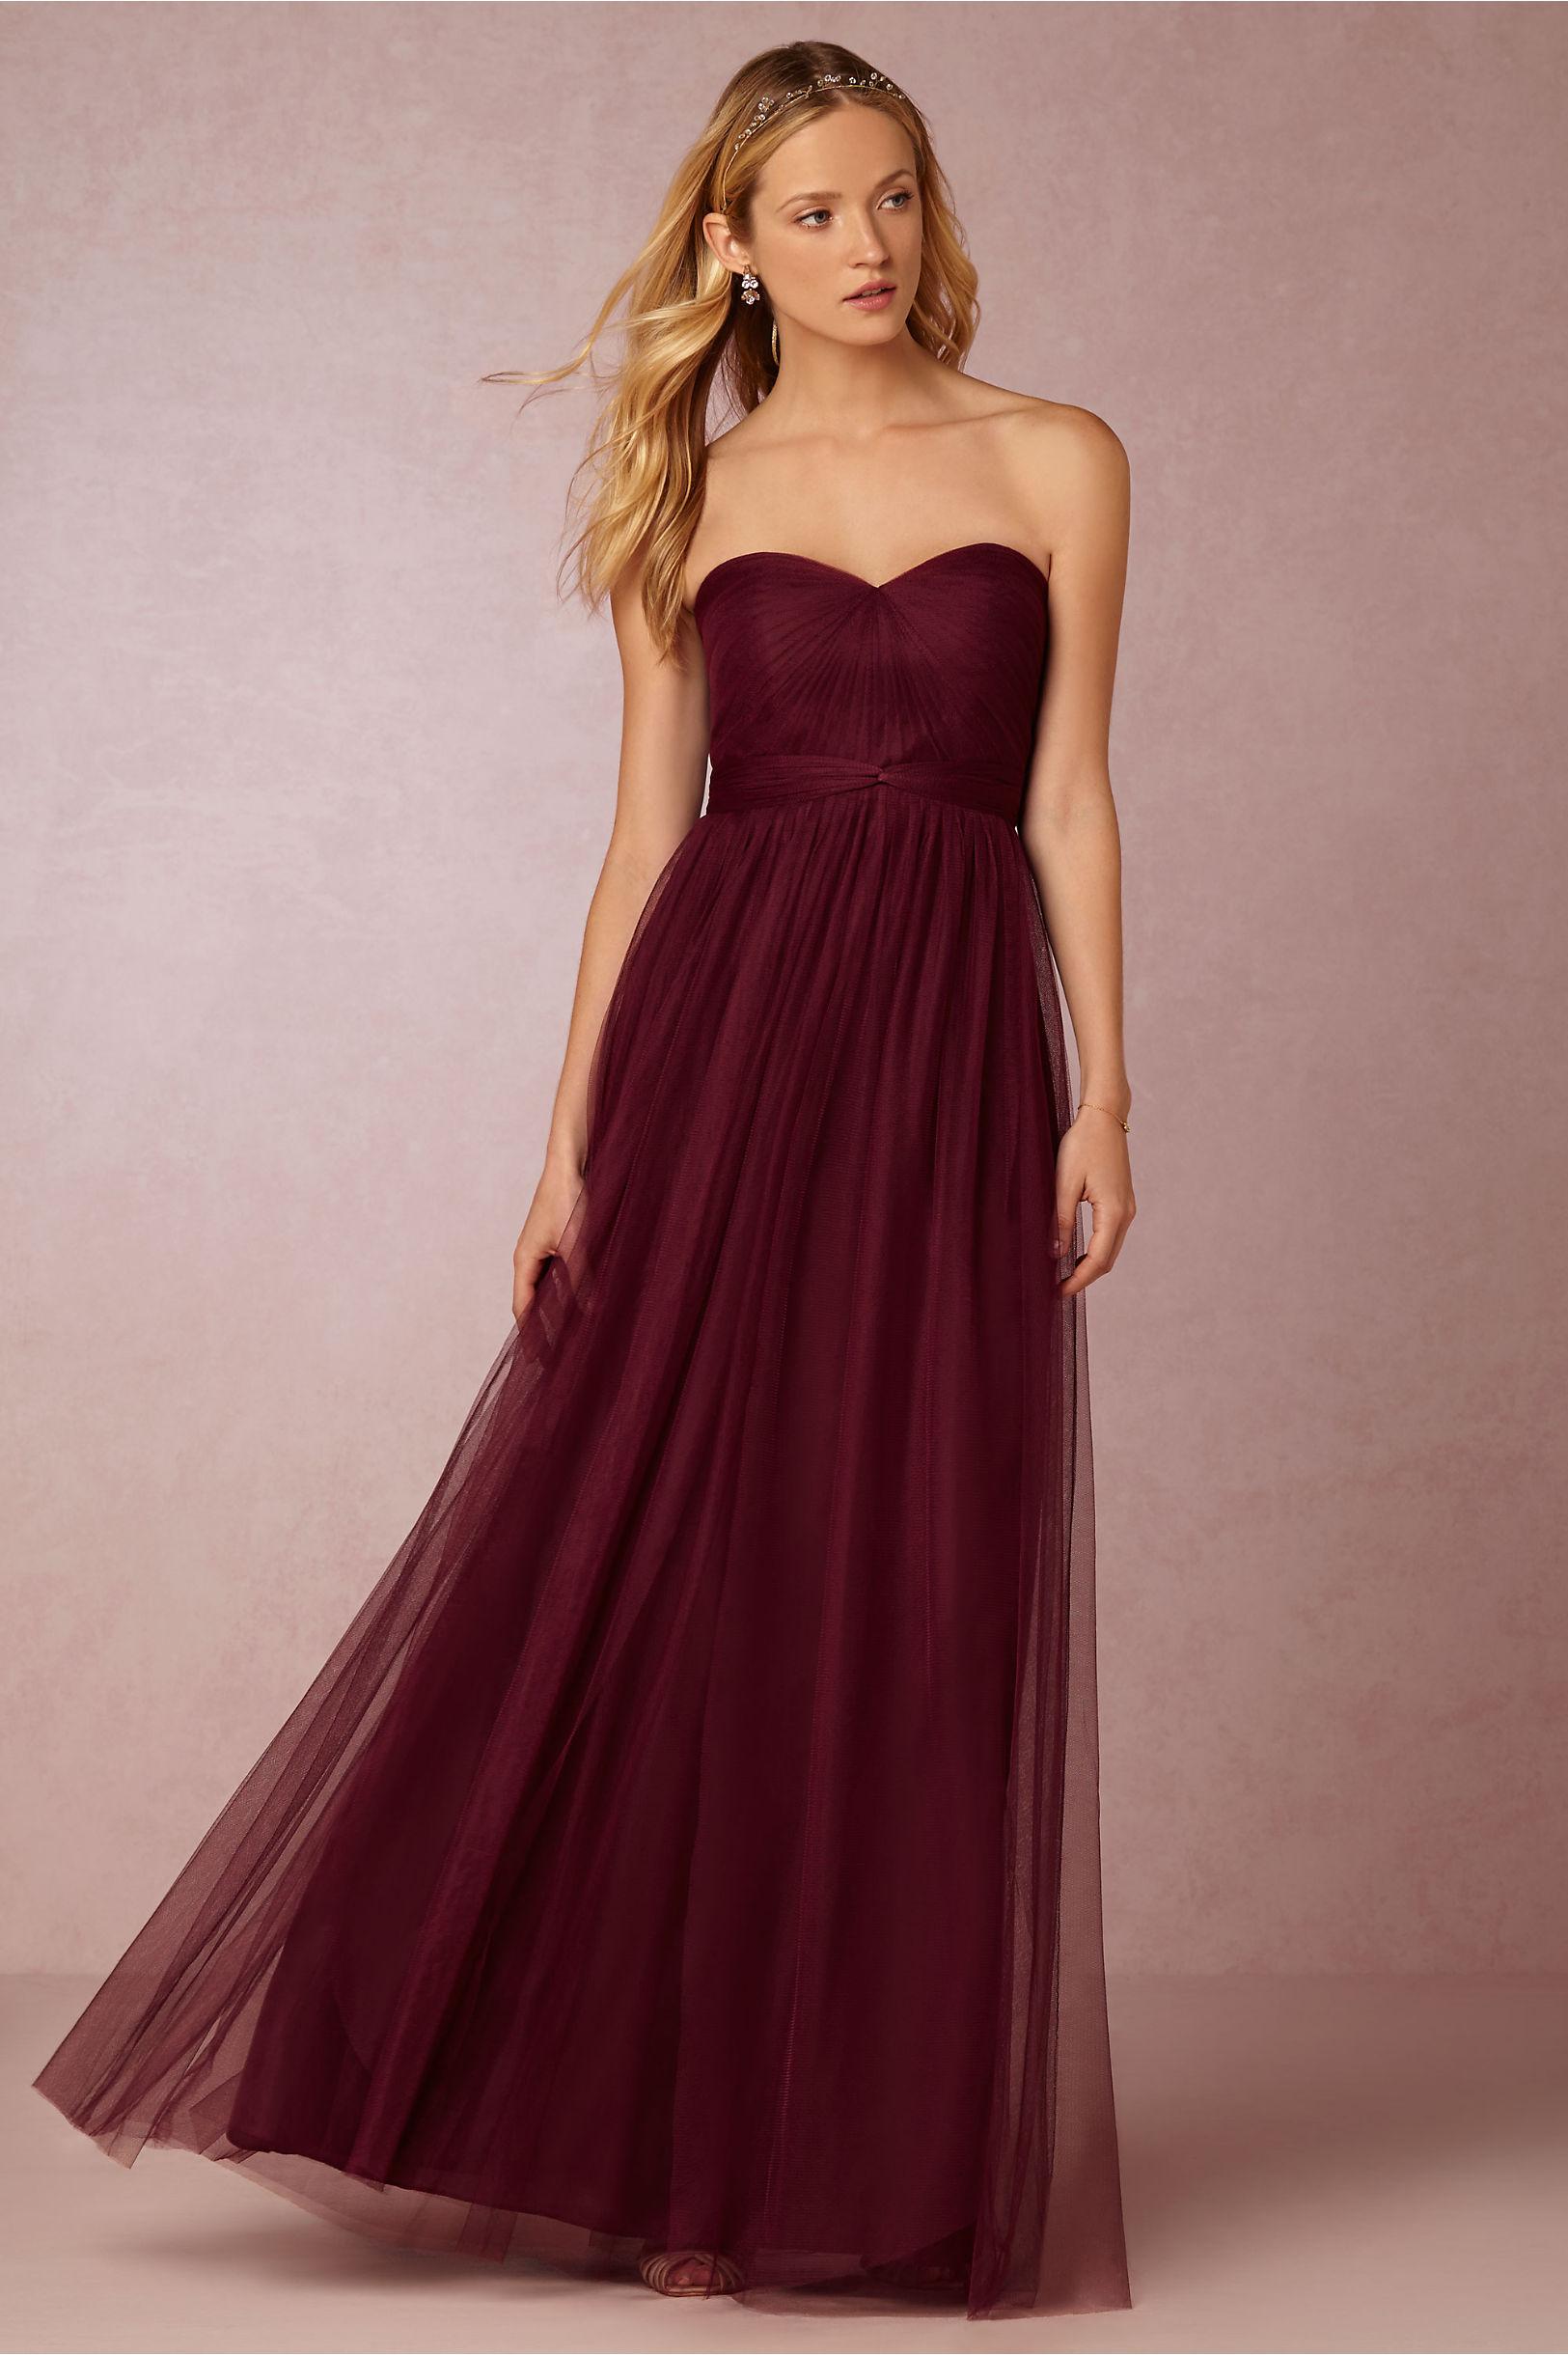 562705d2260f7 Jenny Yoo Black Cherry Annabelle Dress   BHLDN